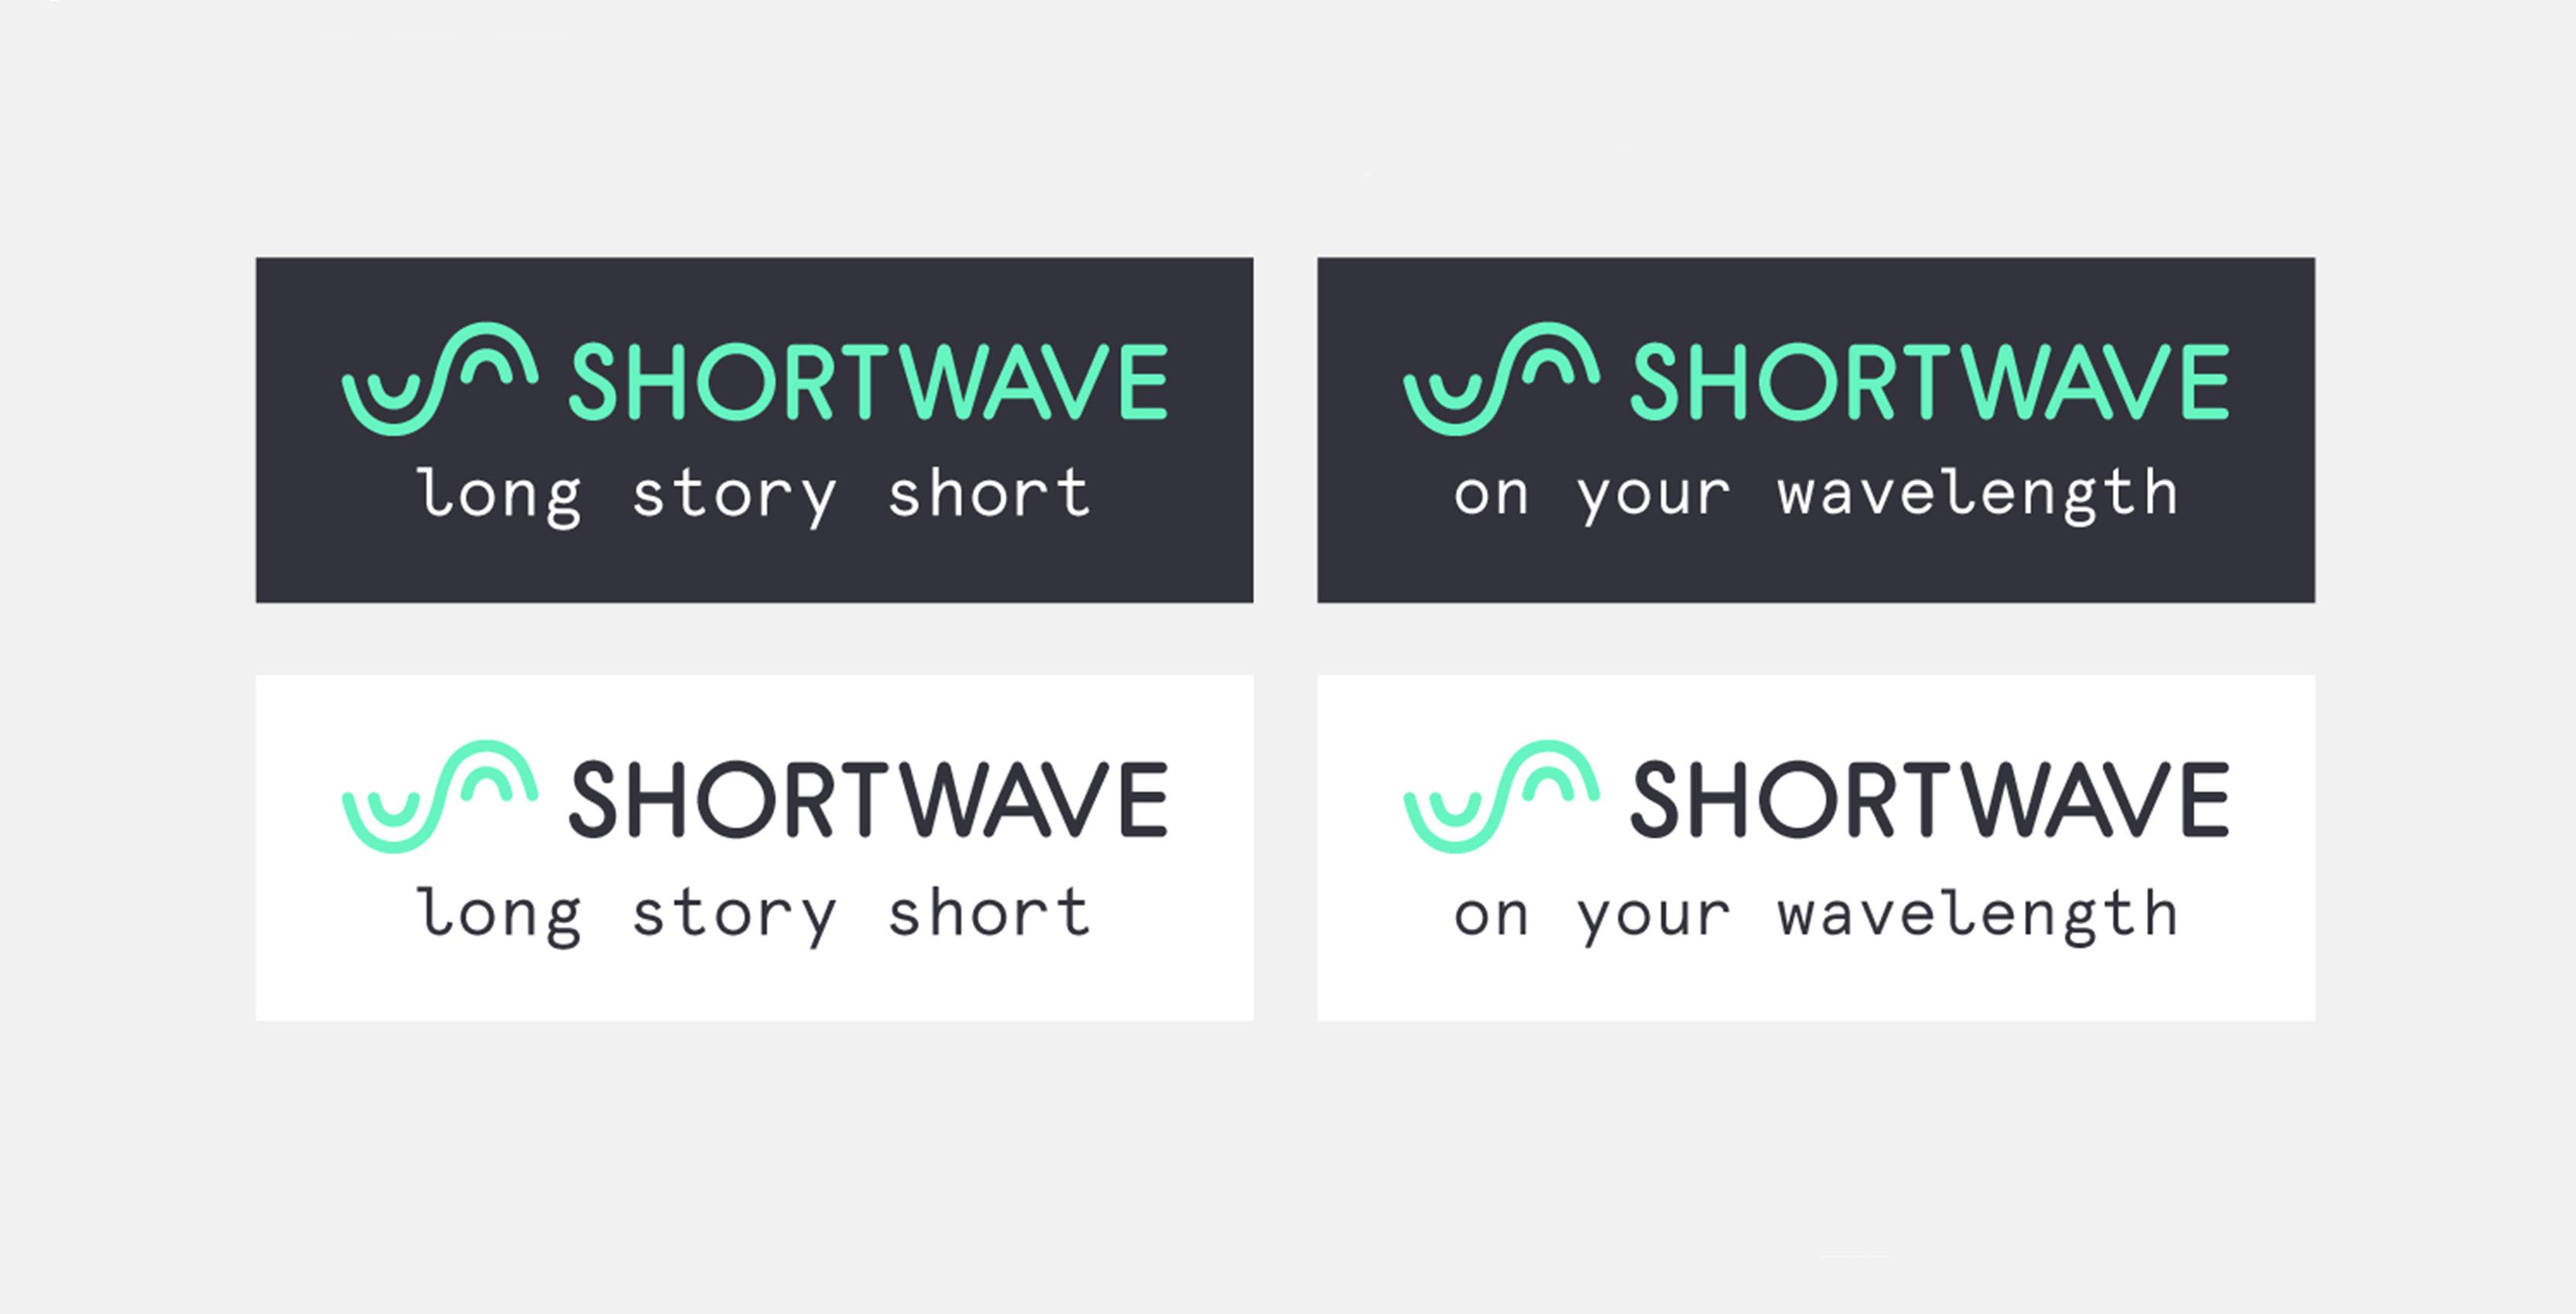 Shortwave logos and slogans